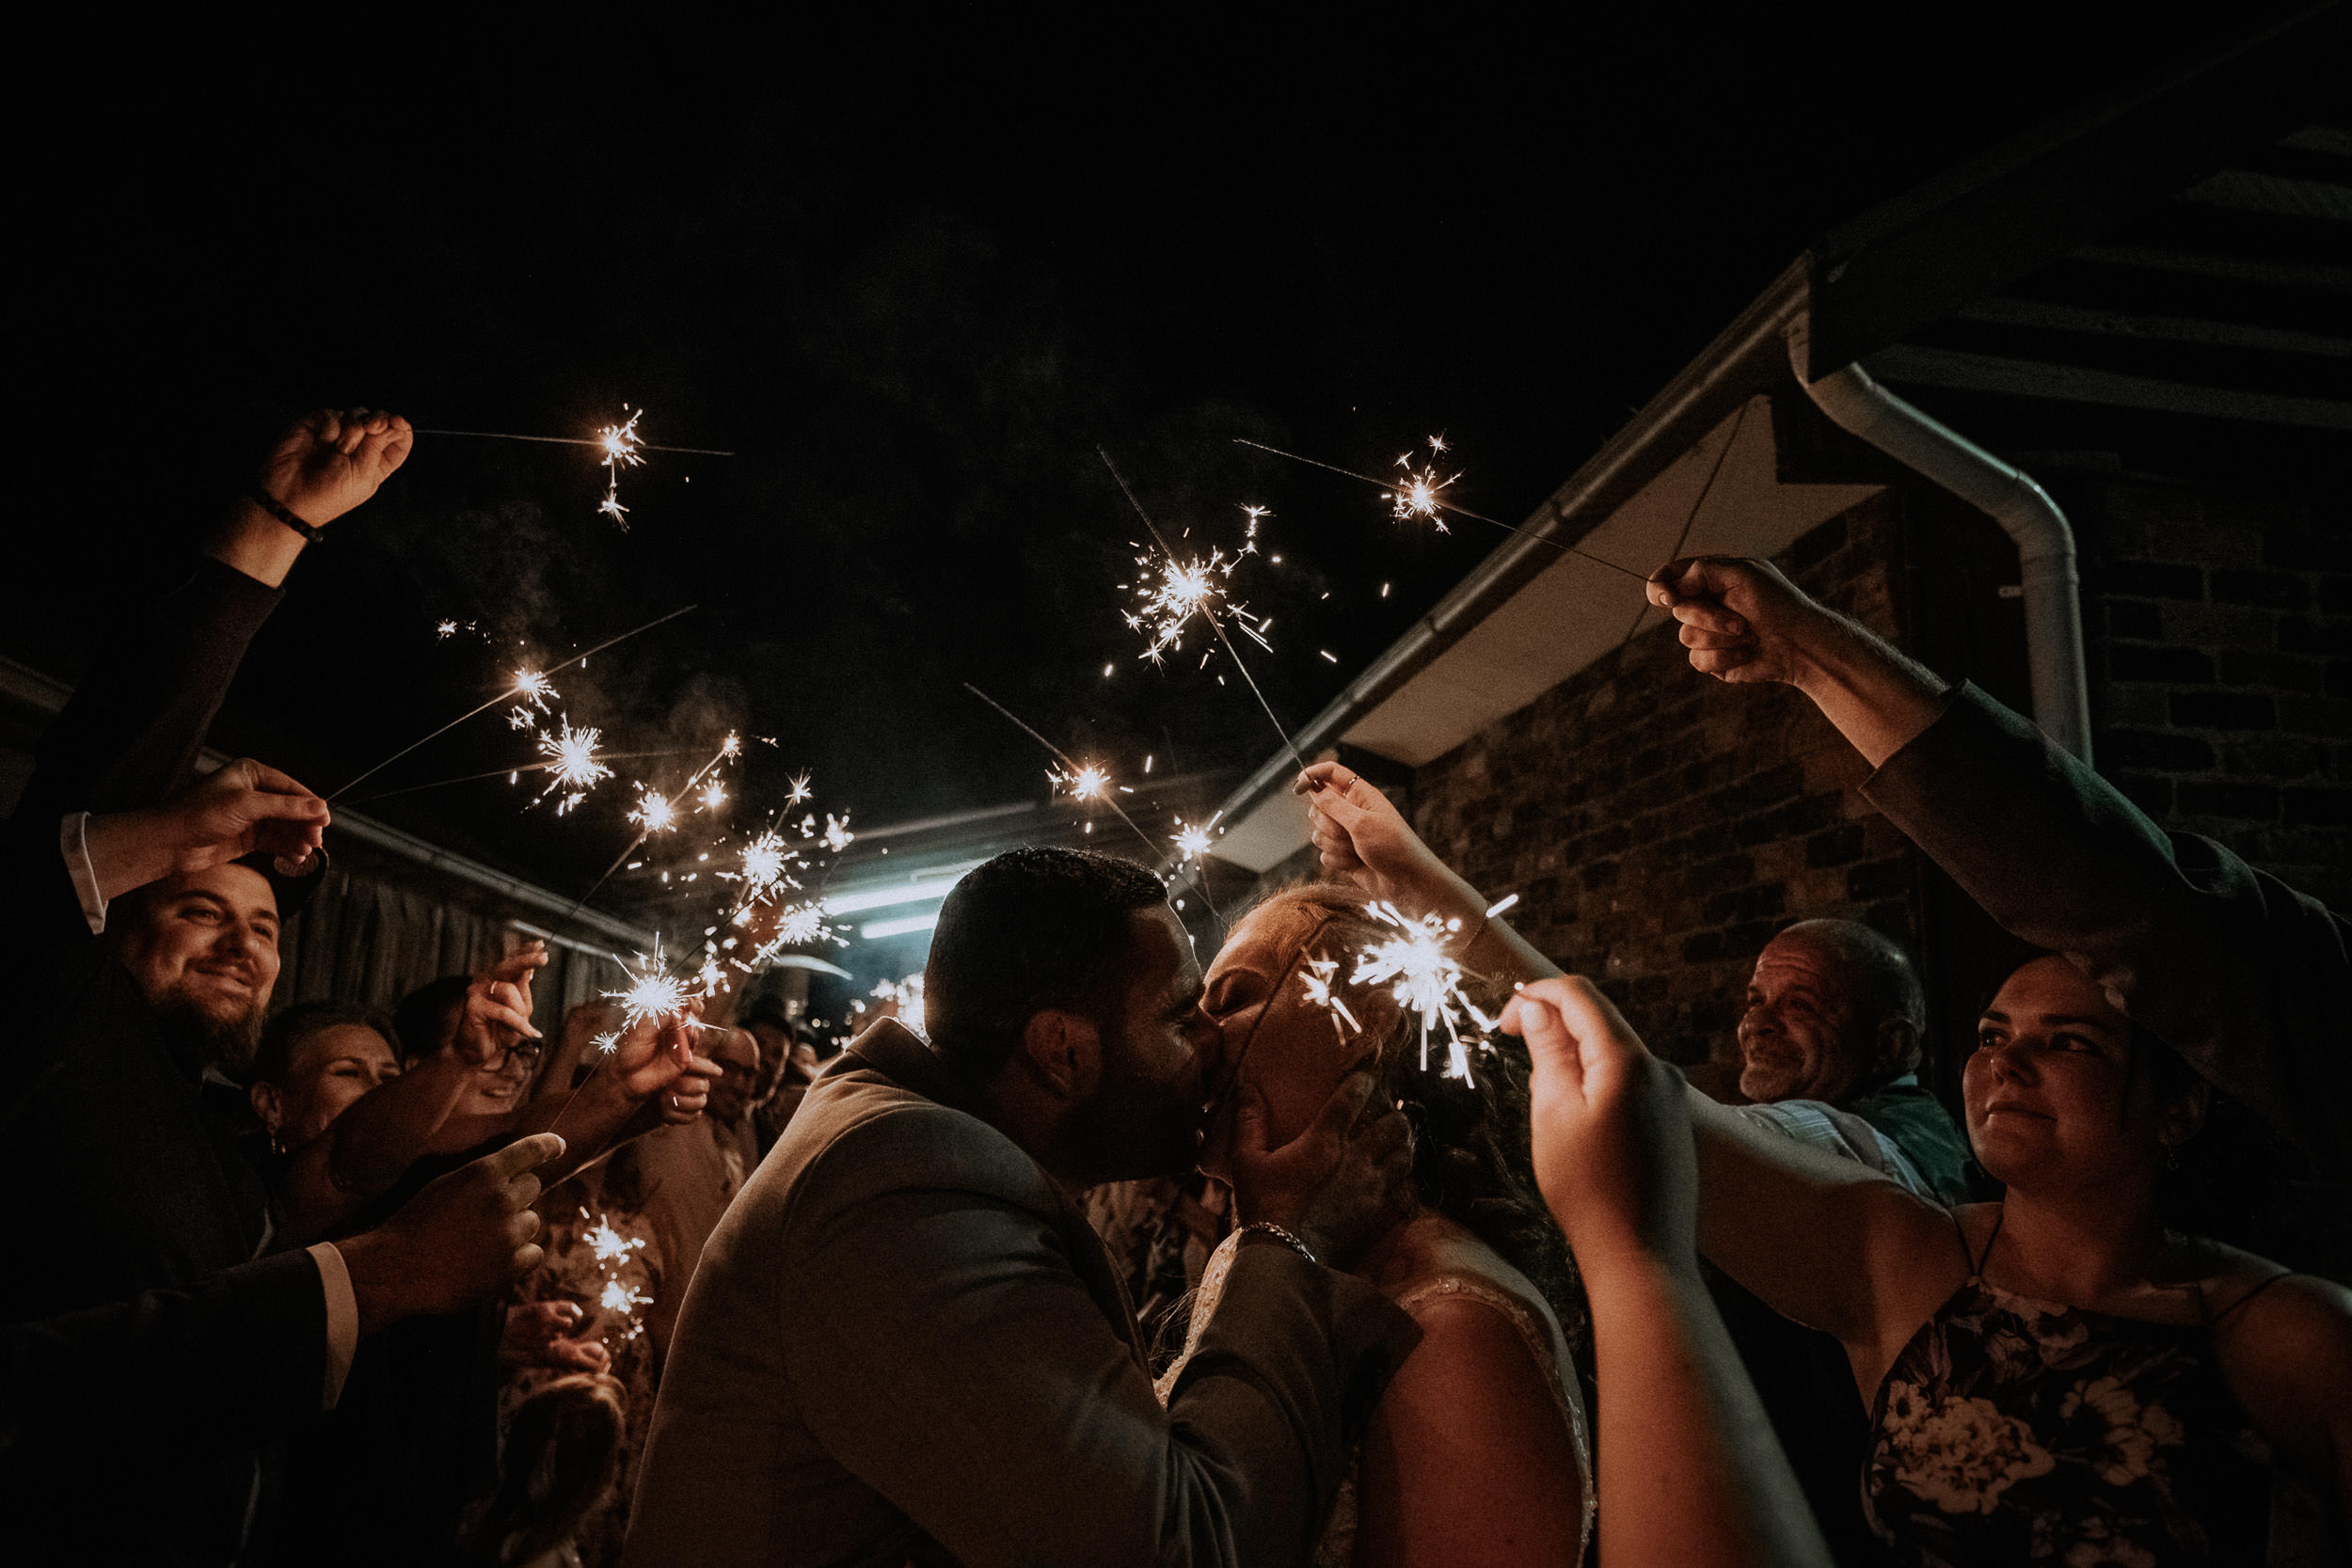 sav & mike_elopement wedding photography_kings & thieves_blog (44 of 44).jpg